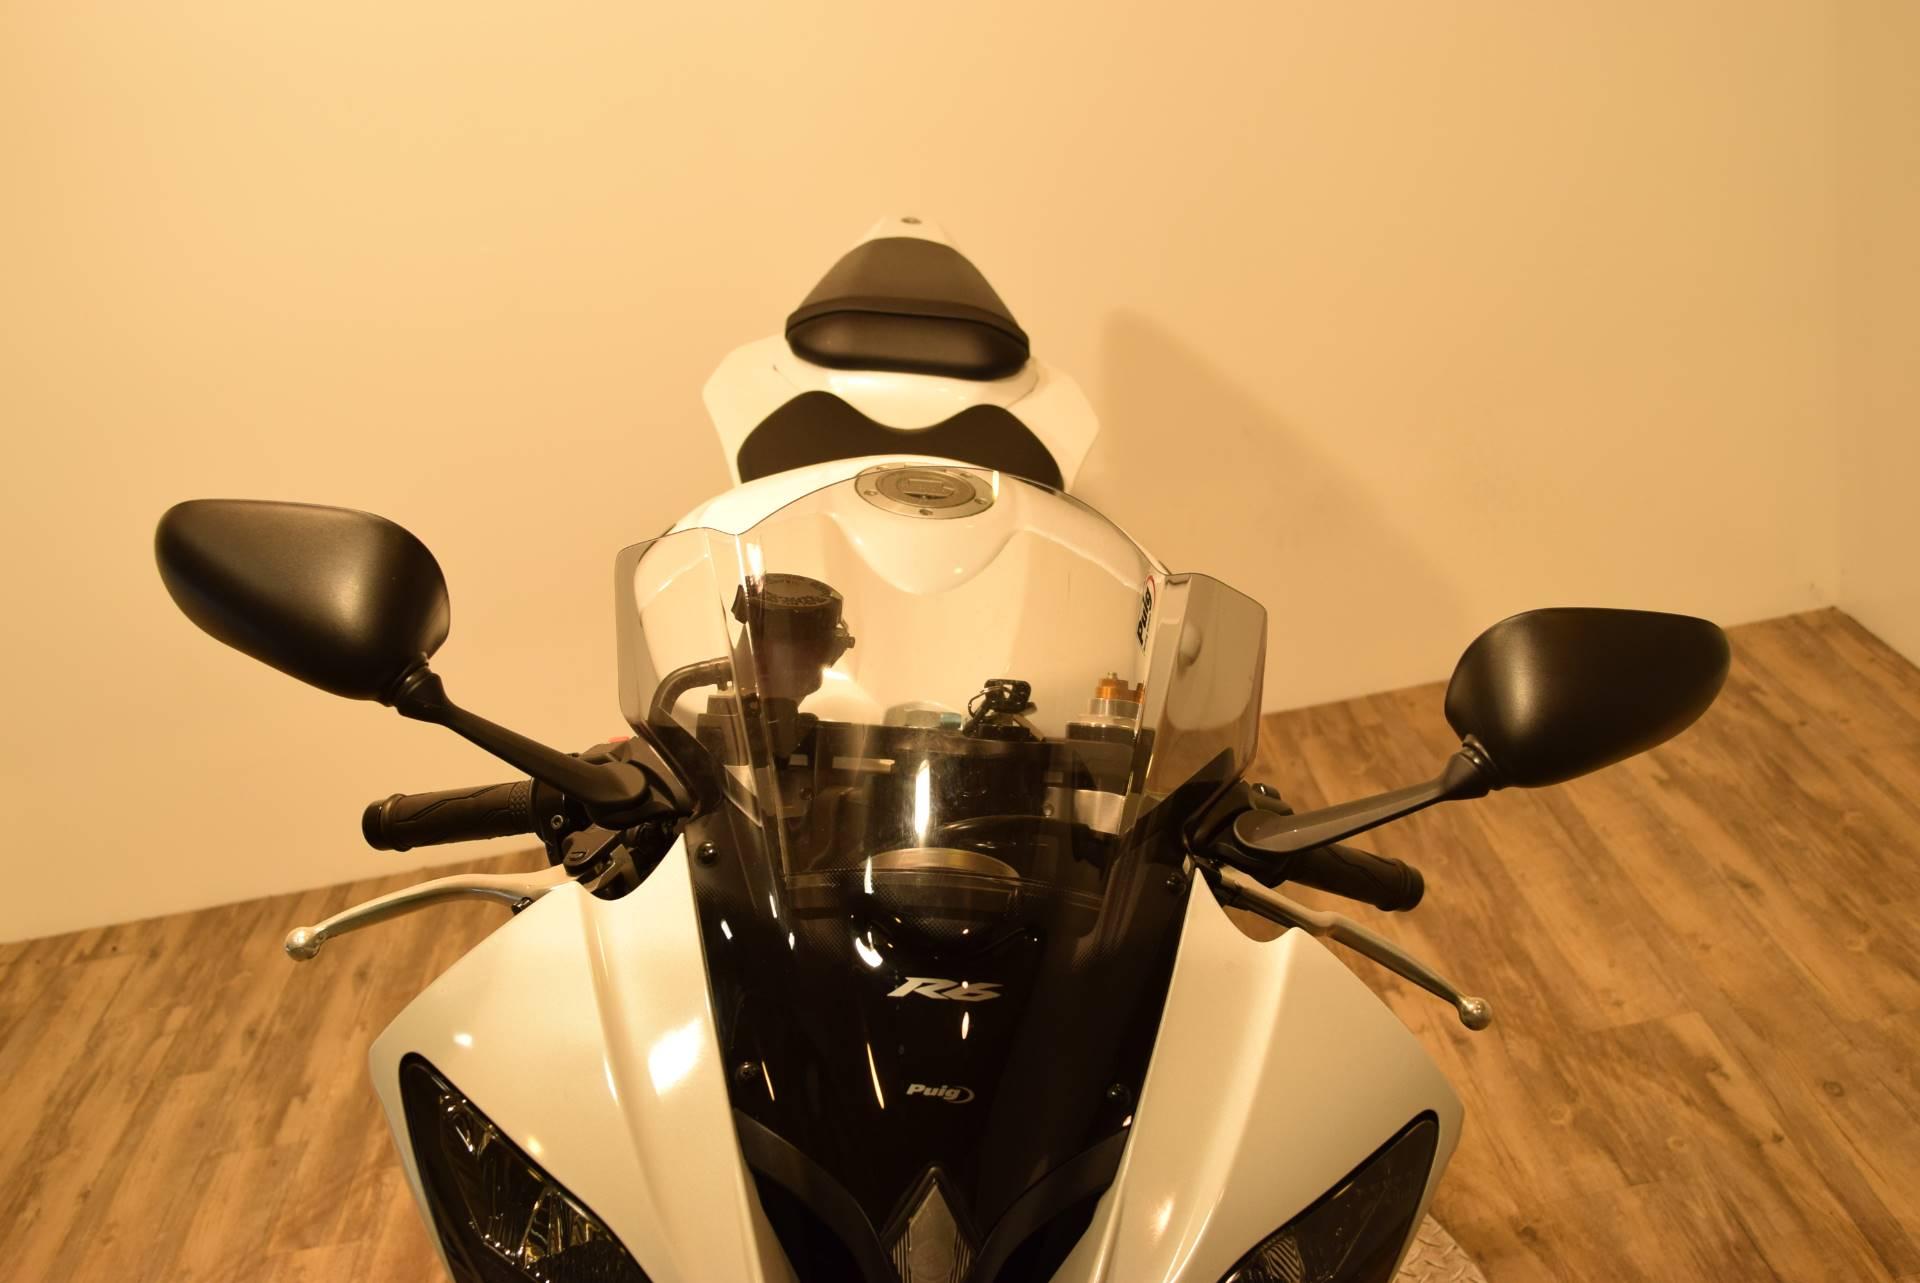 2012 Yamaha YZF-R6 11